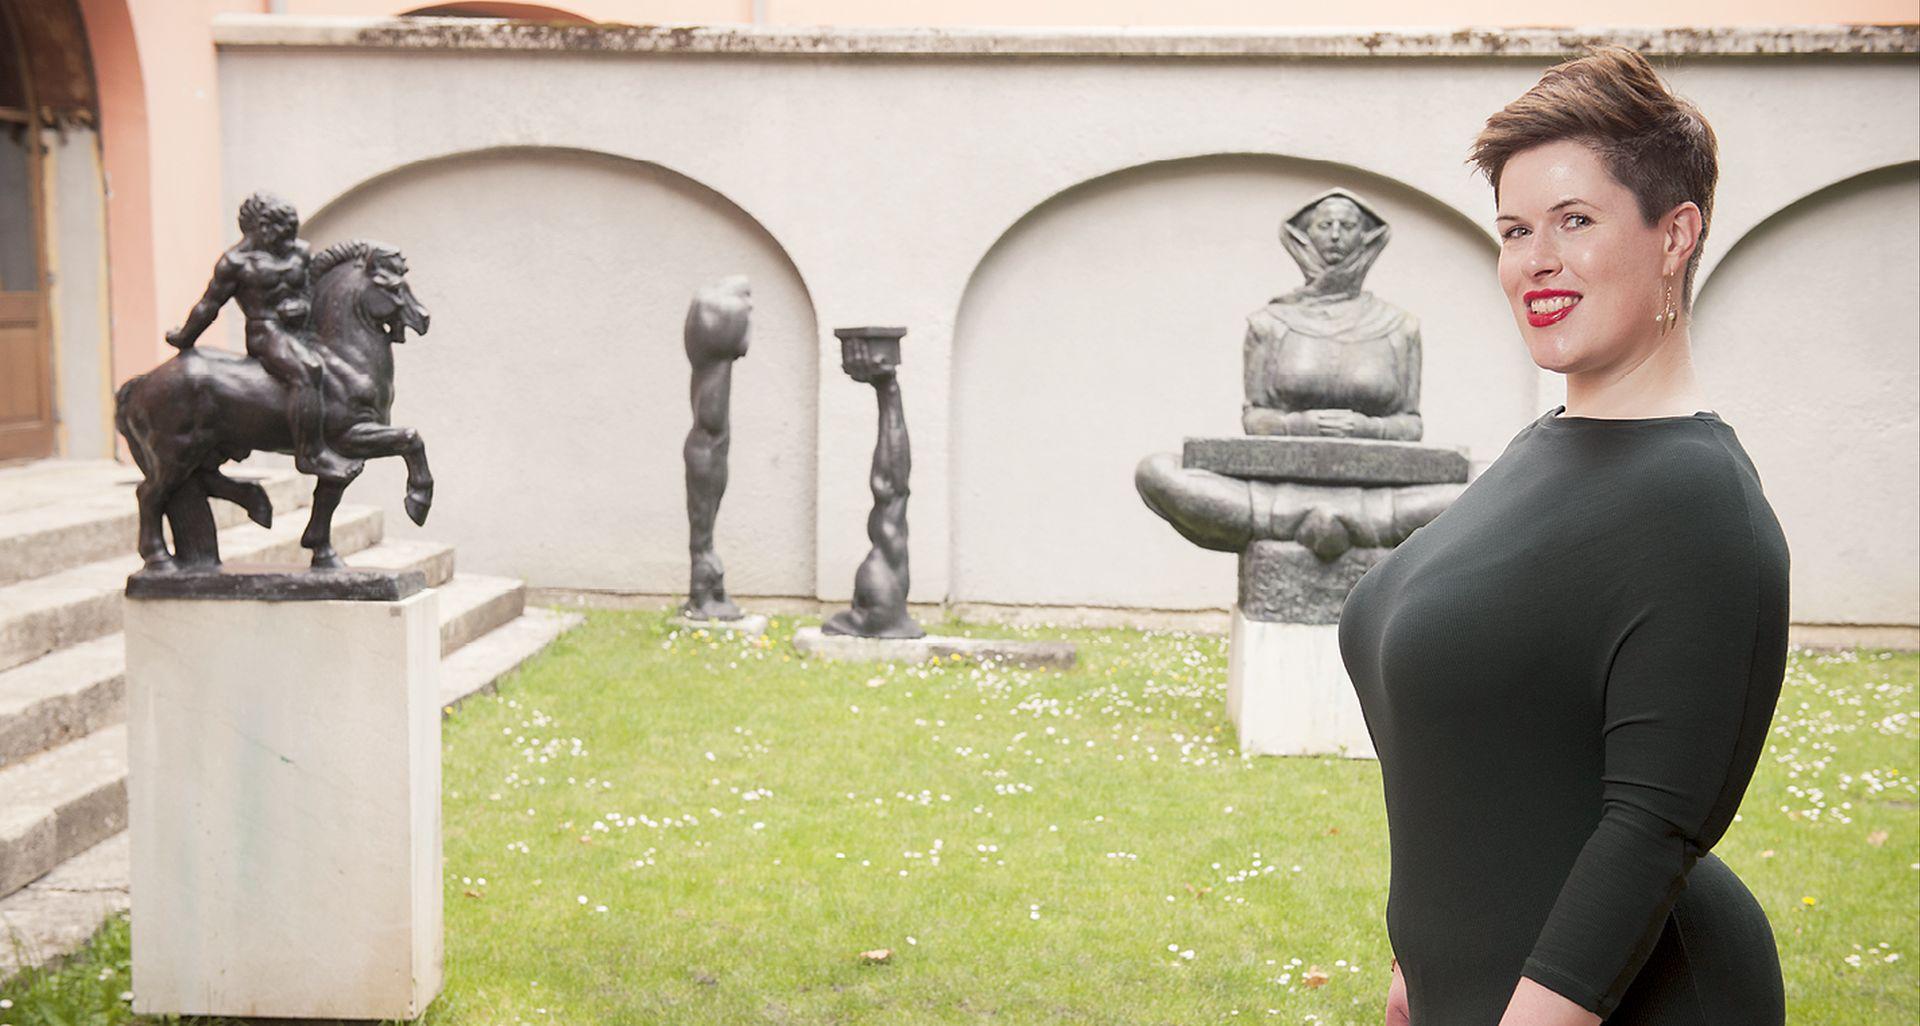 Zagrebačke majstorije 'čuda od kipara'